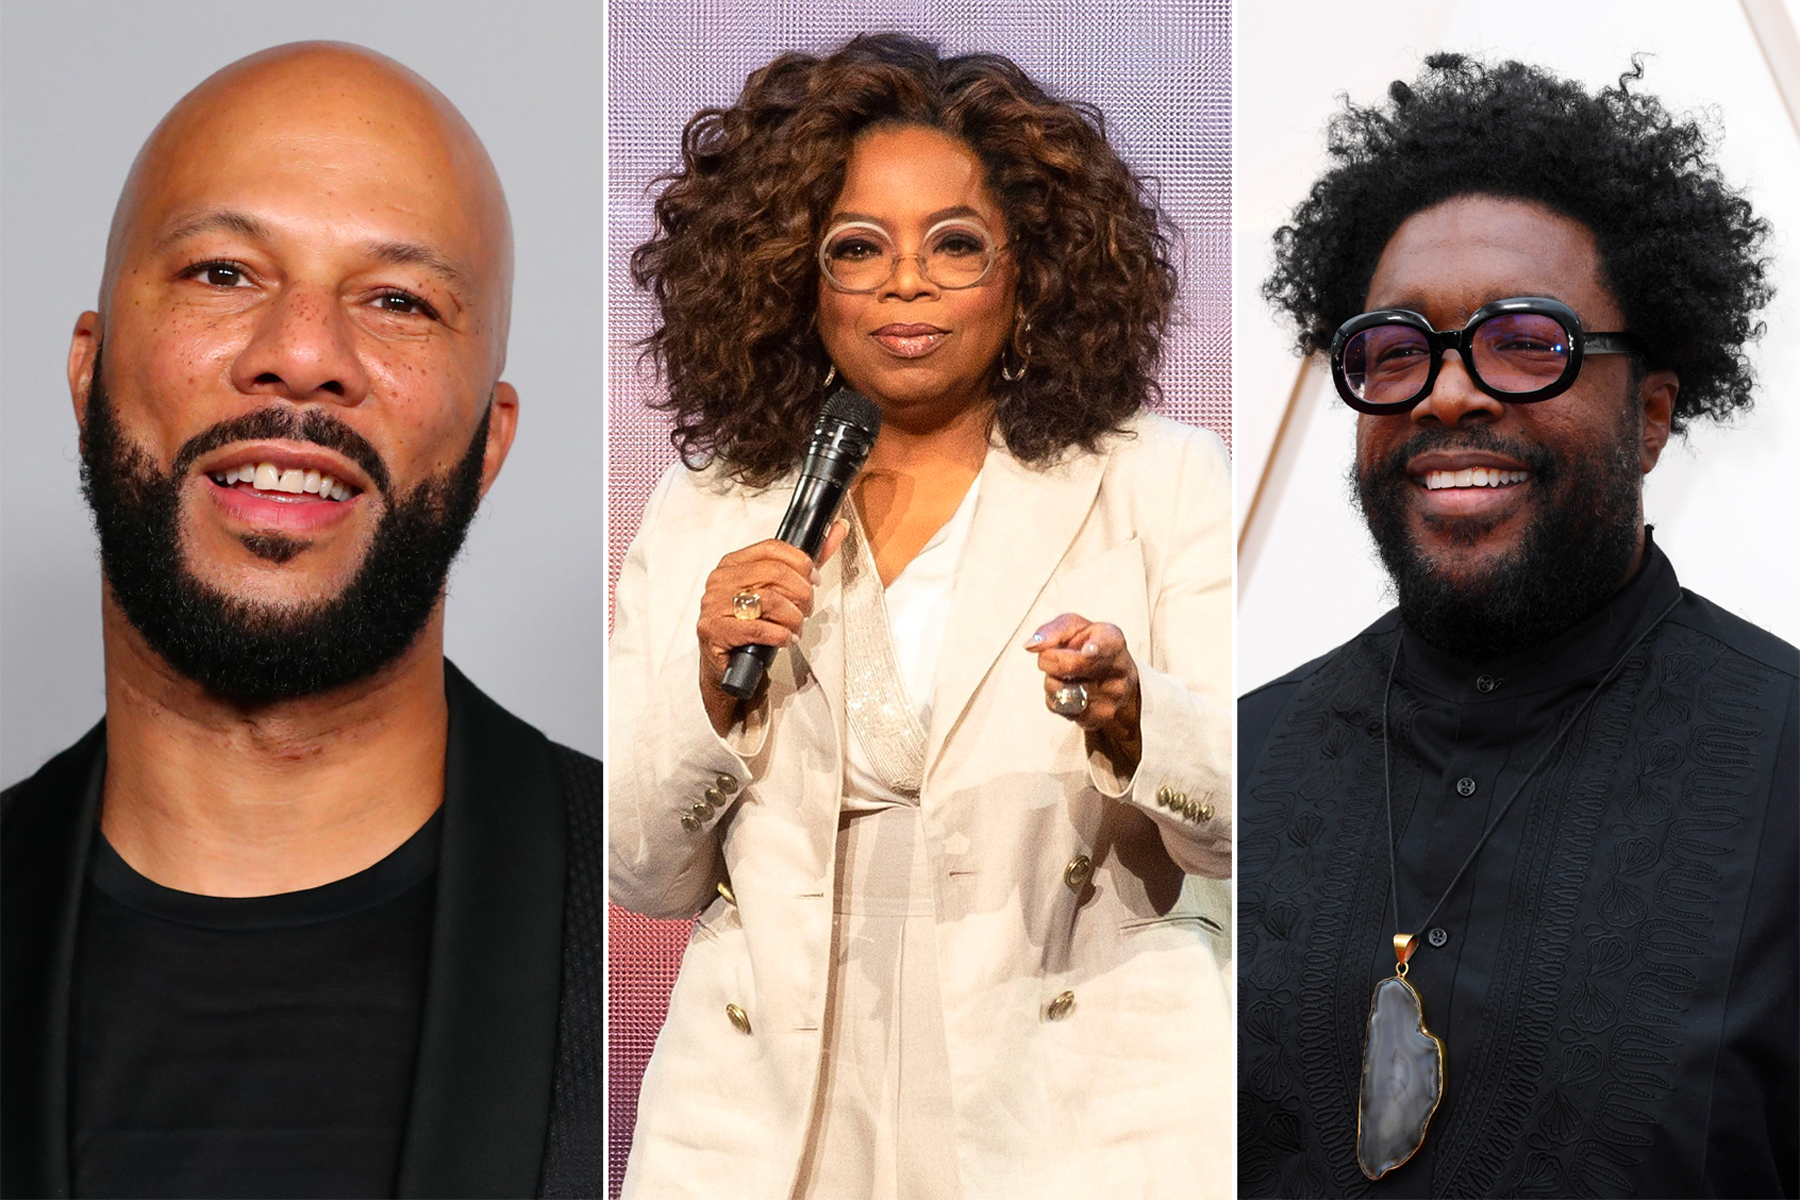 Oprah Winfrey, Questlove, Common Join 'Call to Unite' 24-Hour Livestream